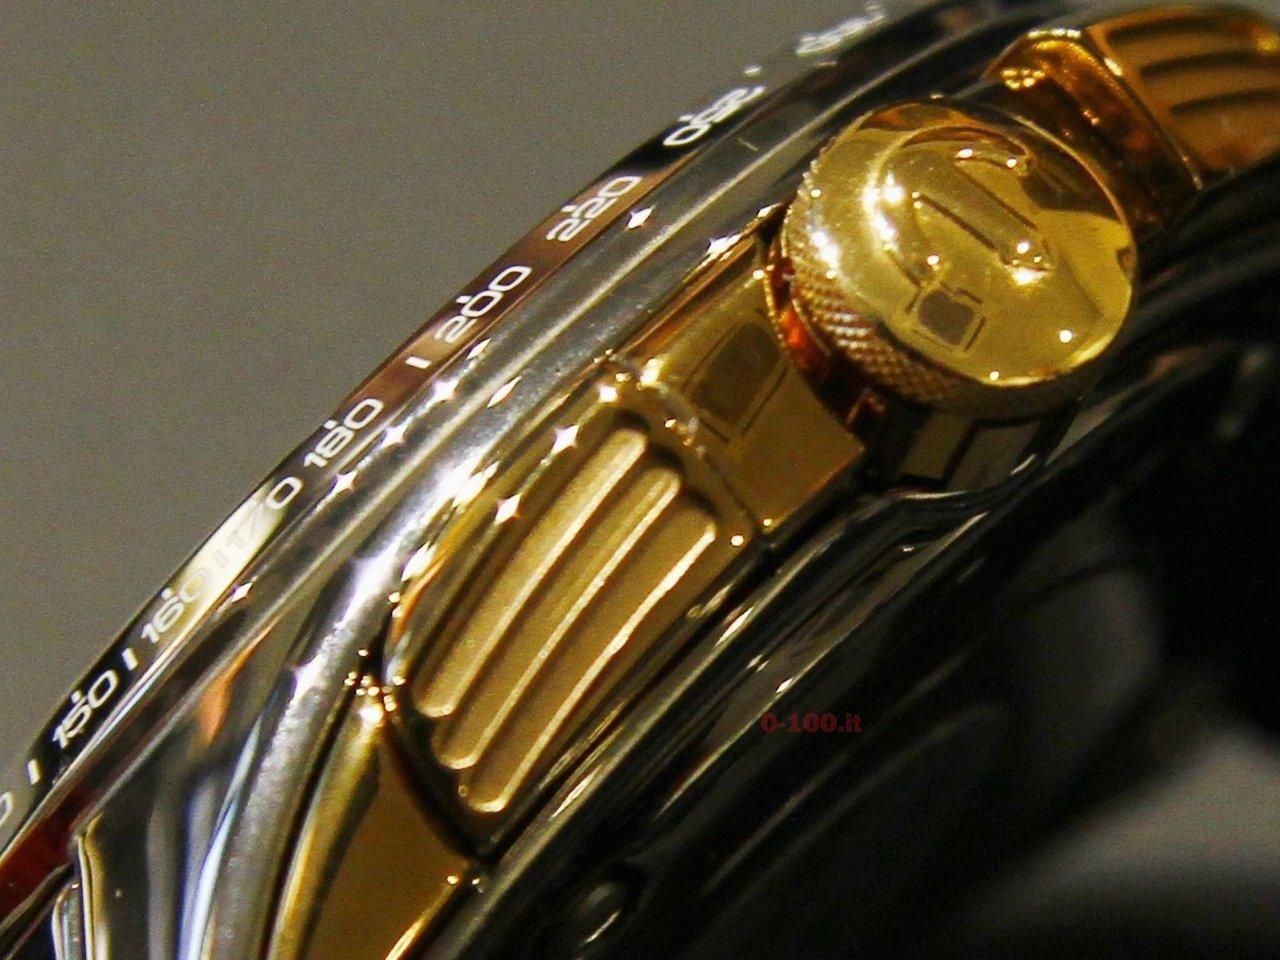 baselworld-2015_rado-hyperchrome-automatic-chronograph--11